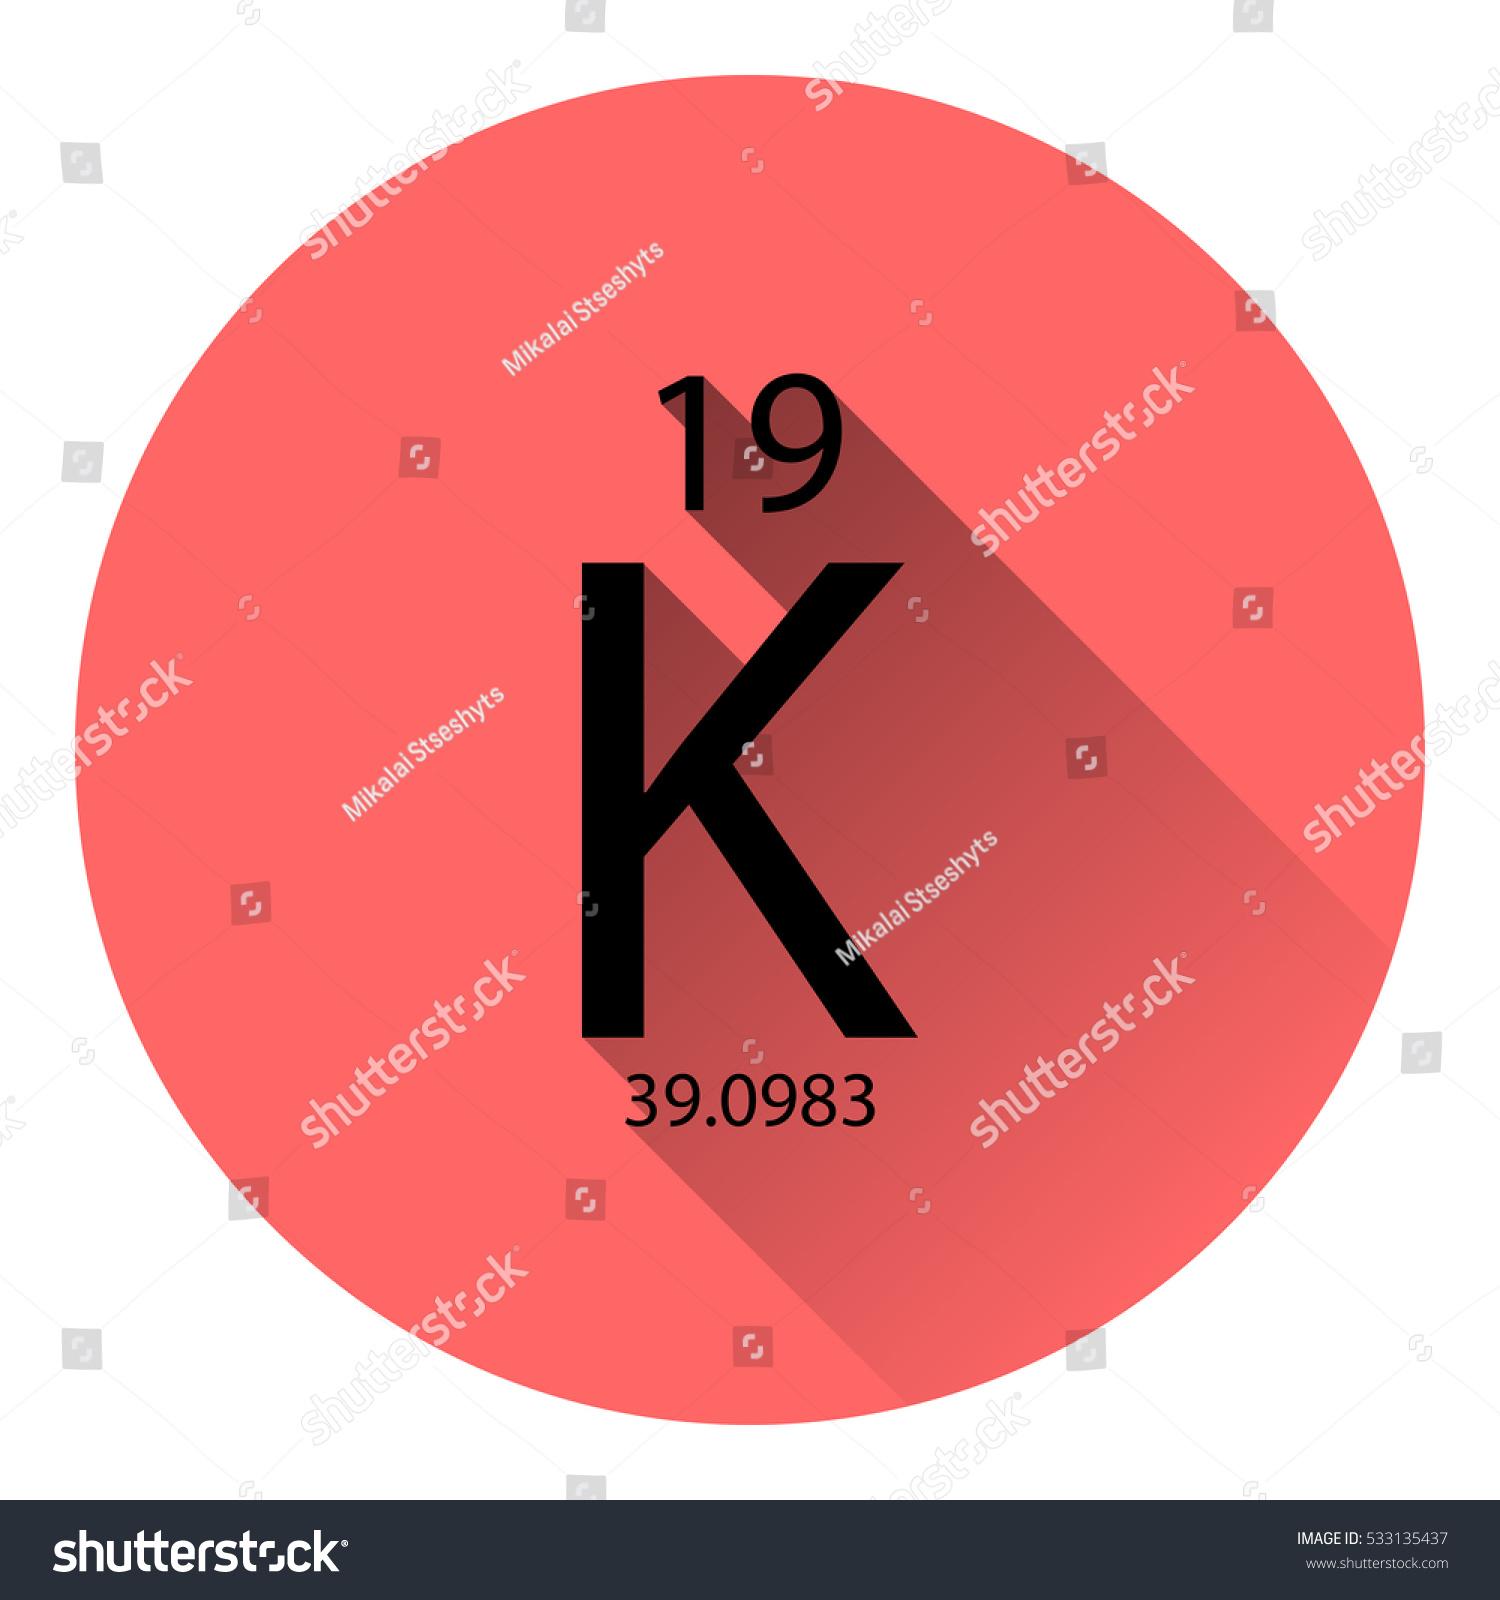 Periodic table element potassium basic properties stock vector the periodic table element potassium with the basic properties flat style with long shadow gamestrikefo Gallery